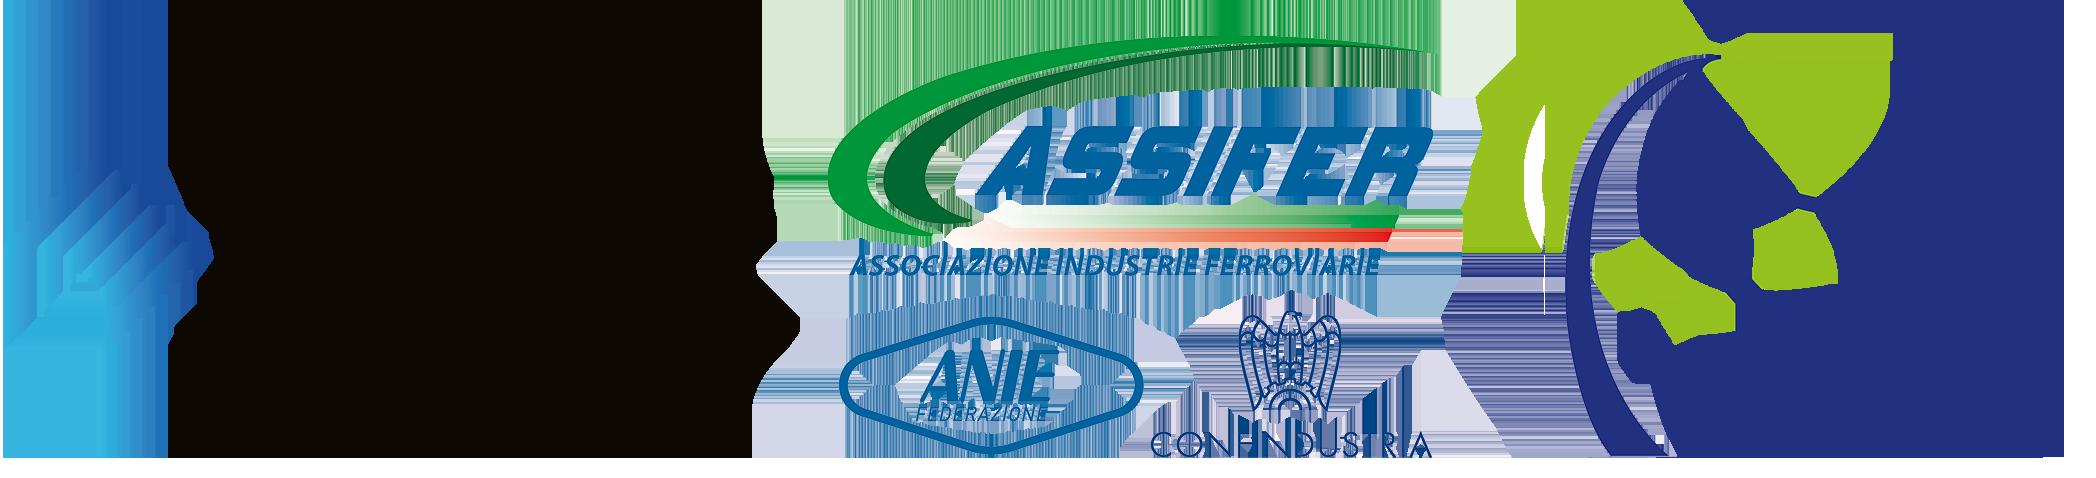 Associate Partner Logos